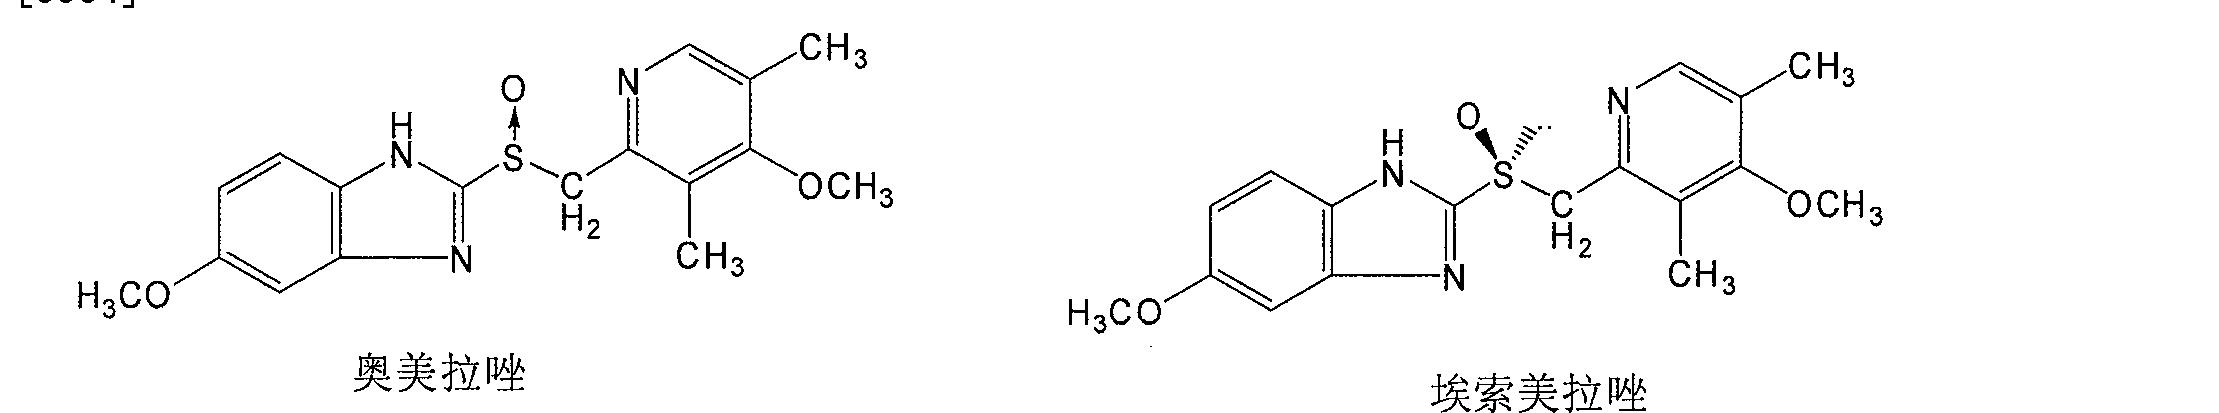 Figure CN102089296AD00041